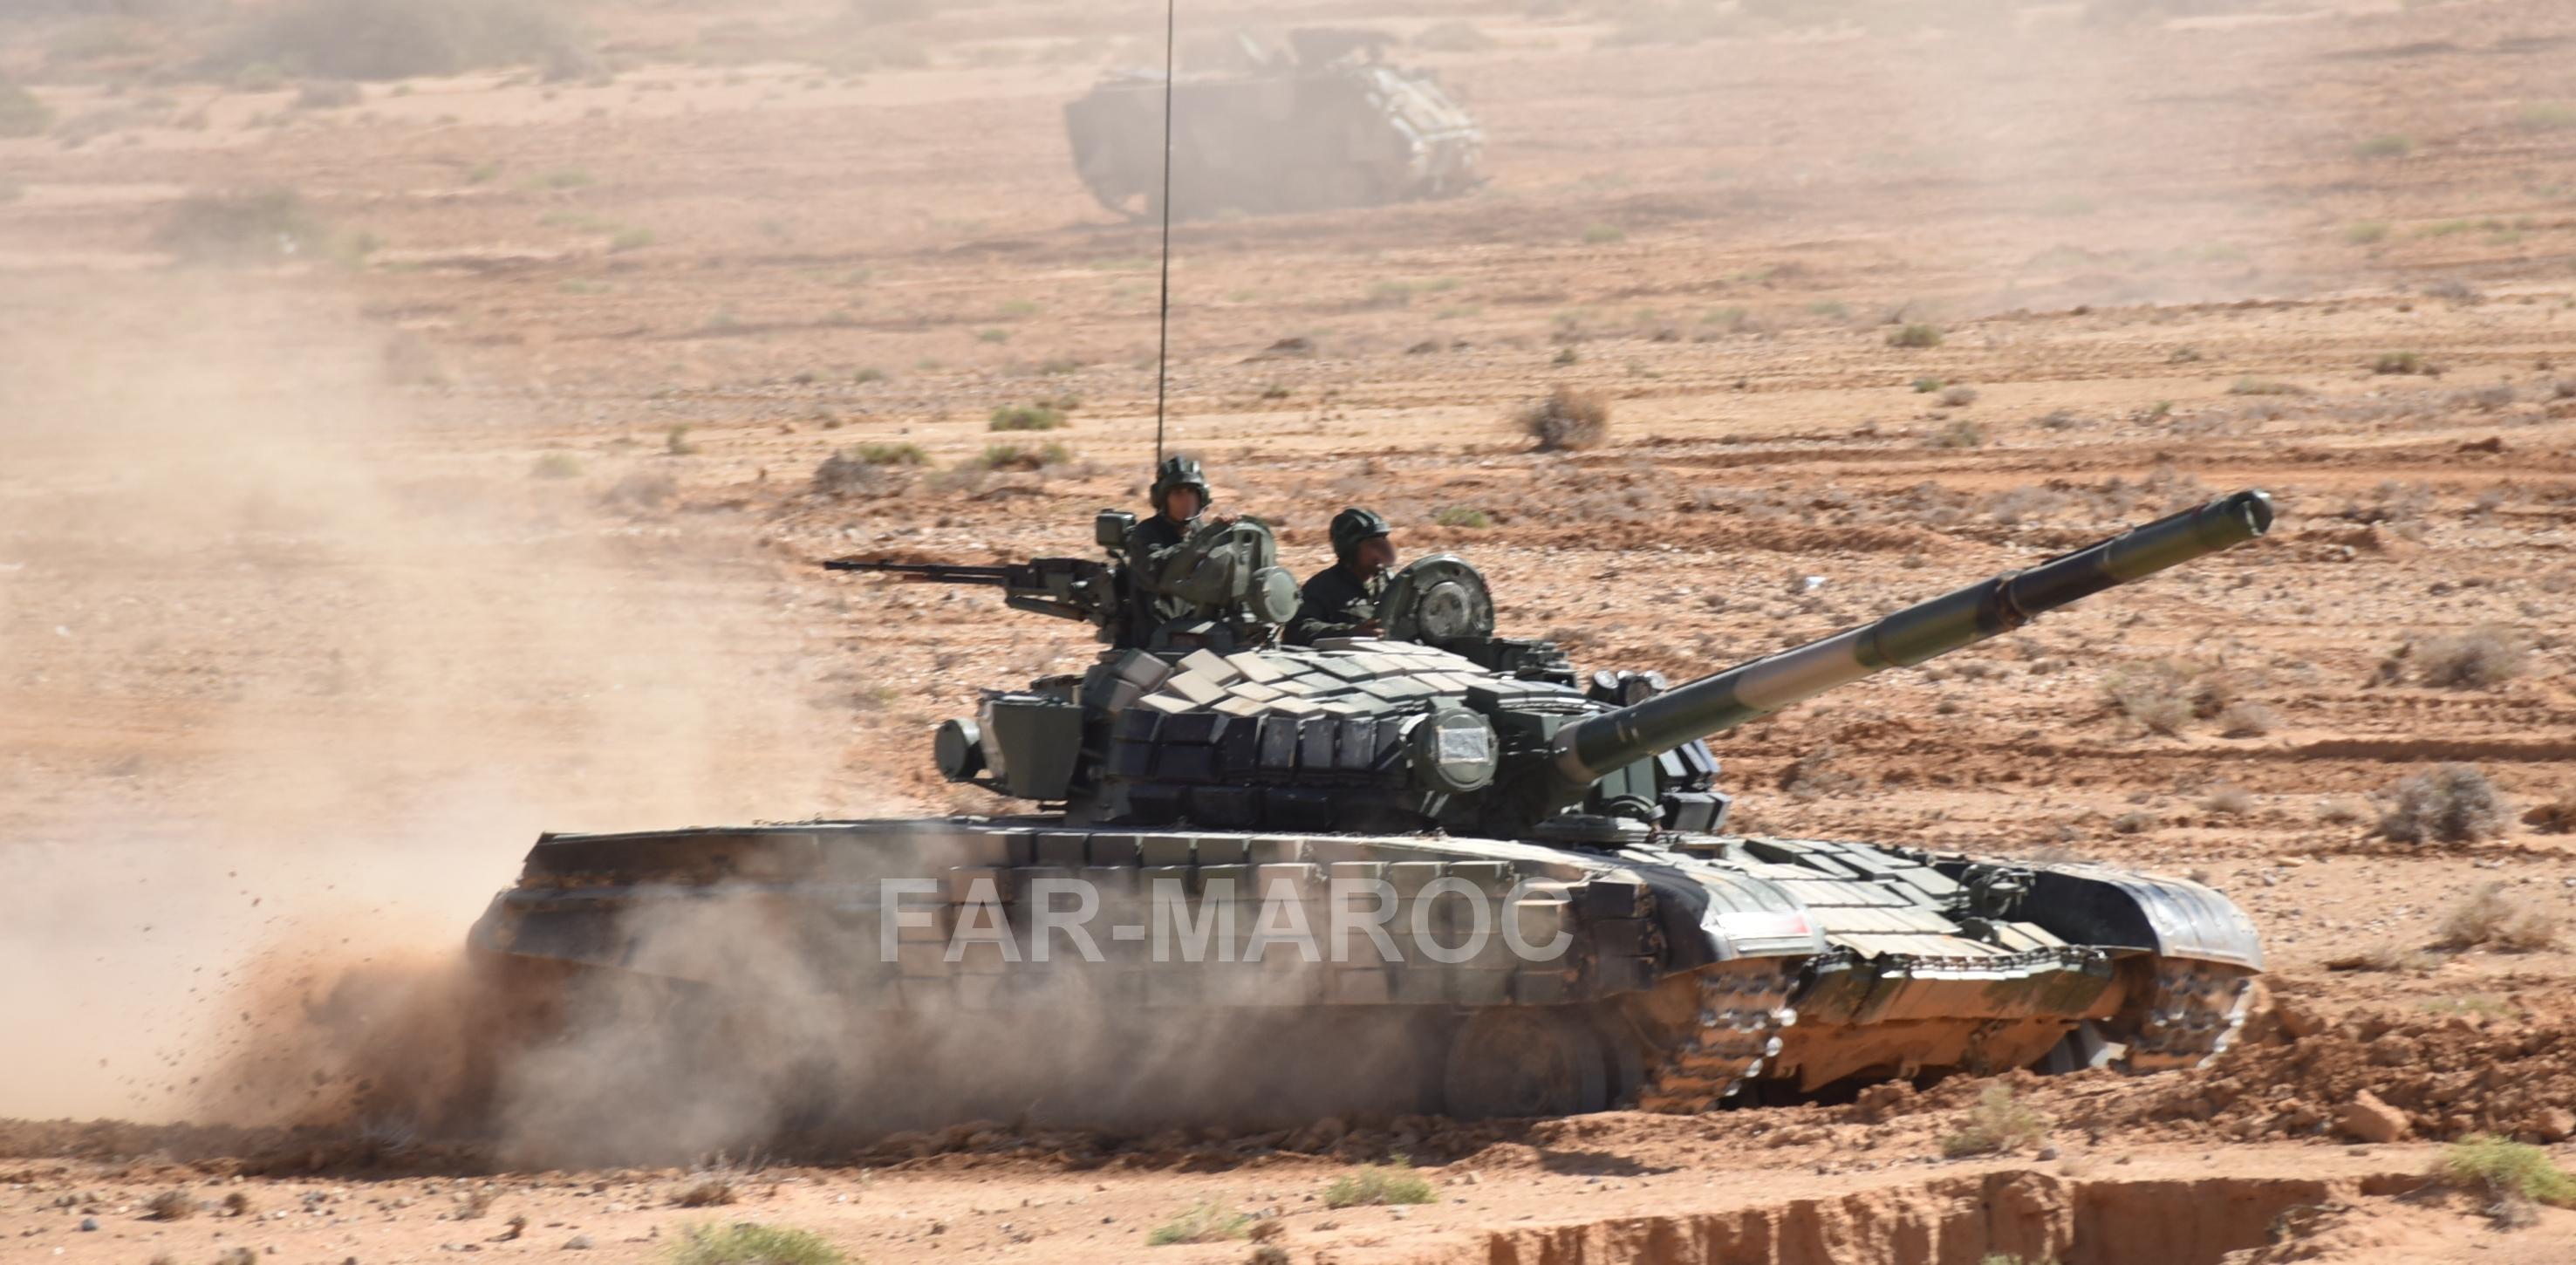 Chars T-72B/BK MArocains // Moroccan Army T-72B/BK Tanks - Page 2 49174125362_ec8a3da861_o